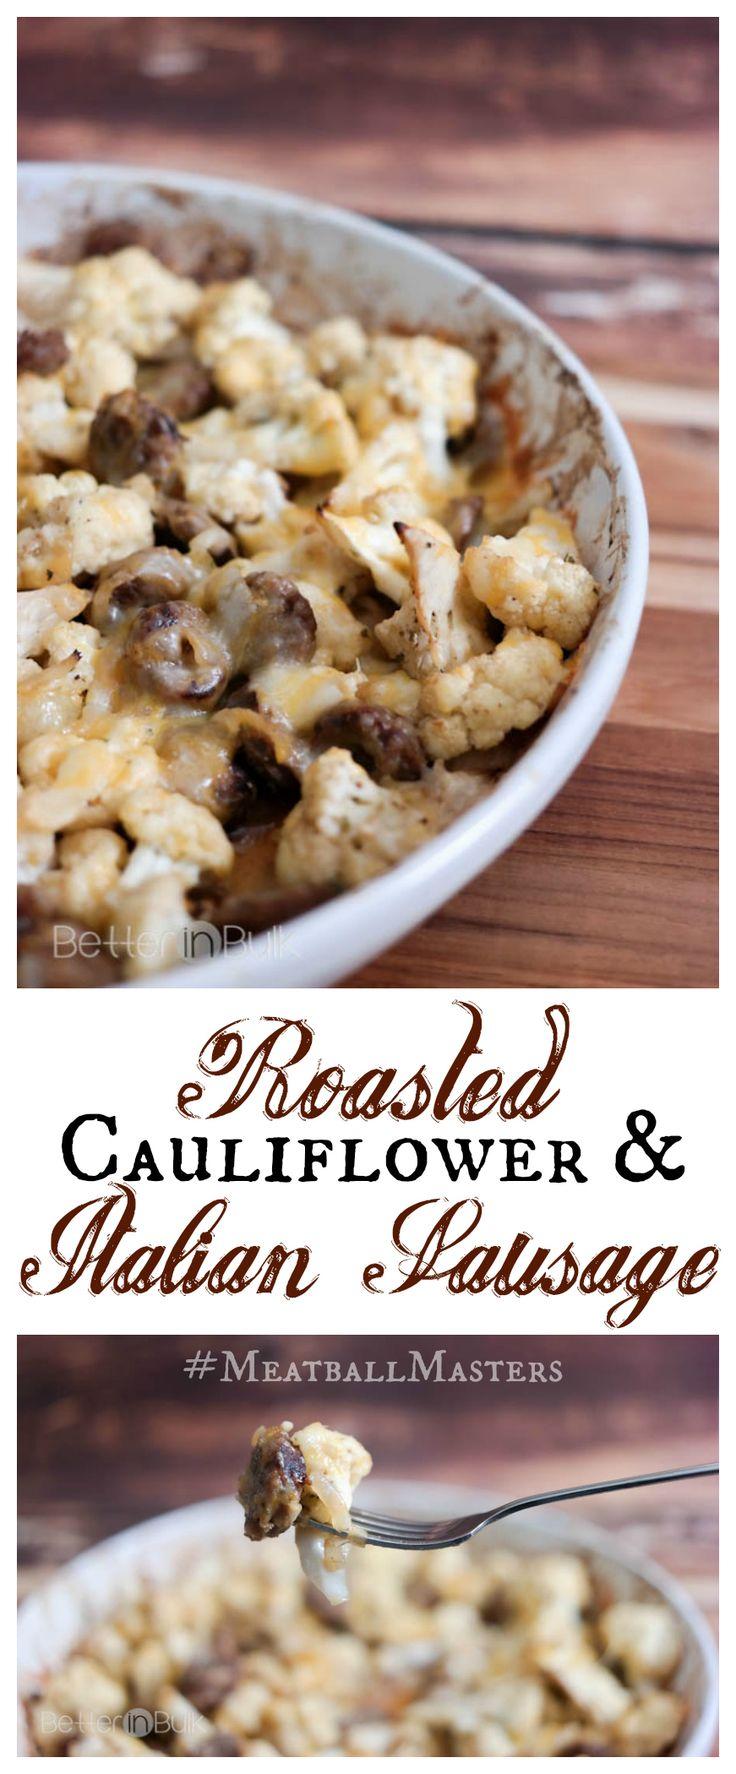 Roasted Cajun Cauliflower and Sausage with Johnsonville®  #MeatballMasters #sponsored